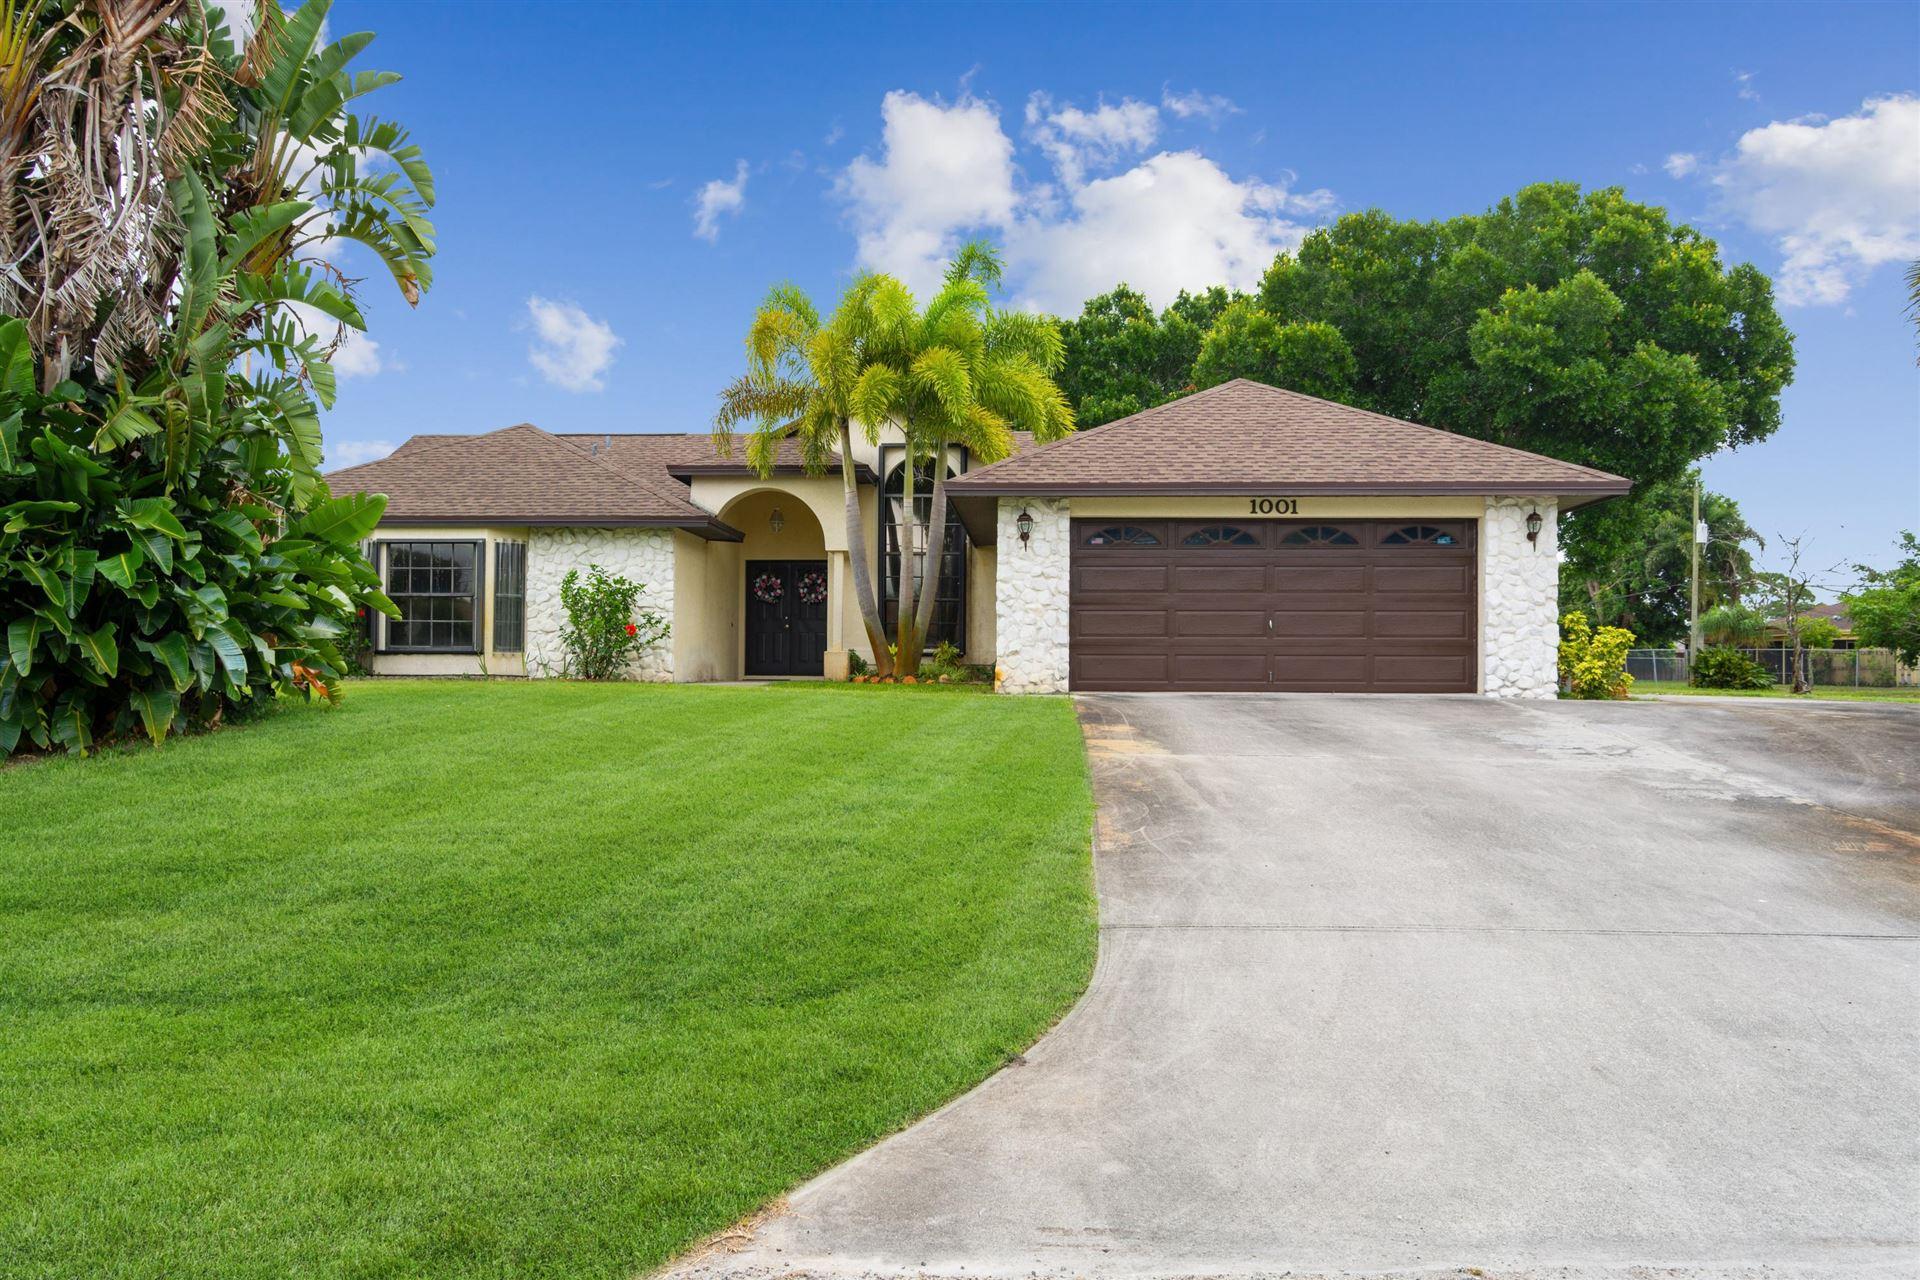 1001 SW Curtis Street, Port Saint Lucie, FL 34983 - MLS#: RX-10716129